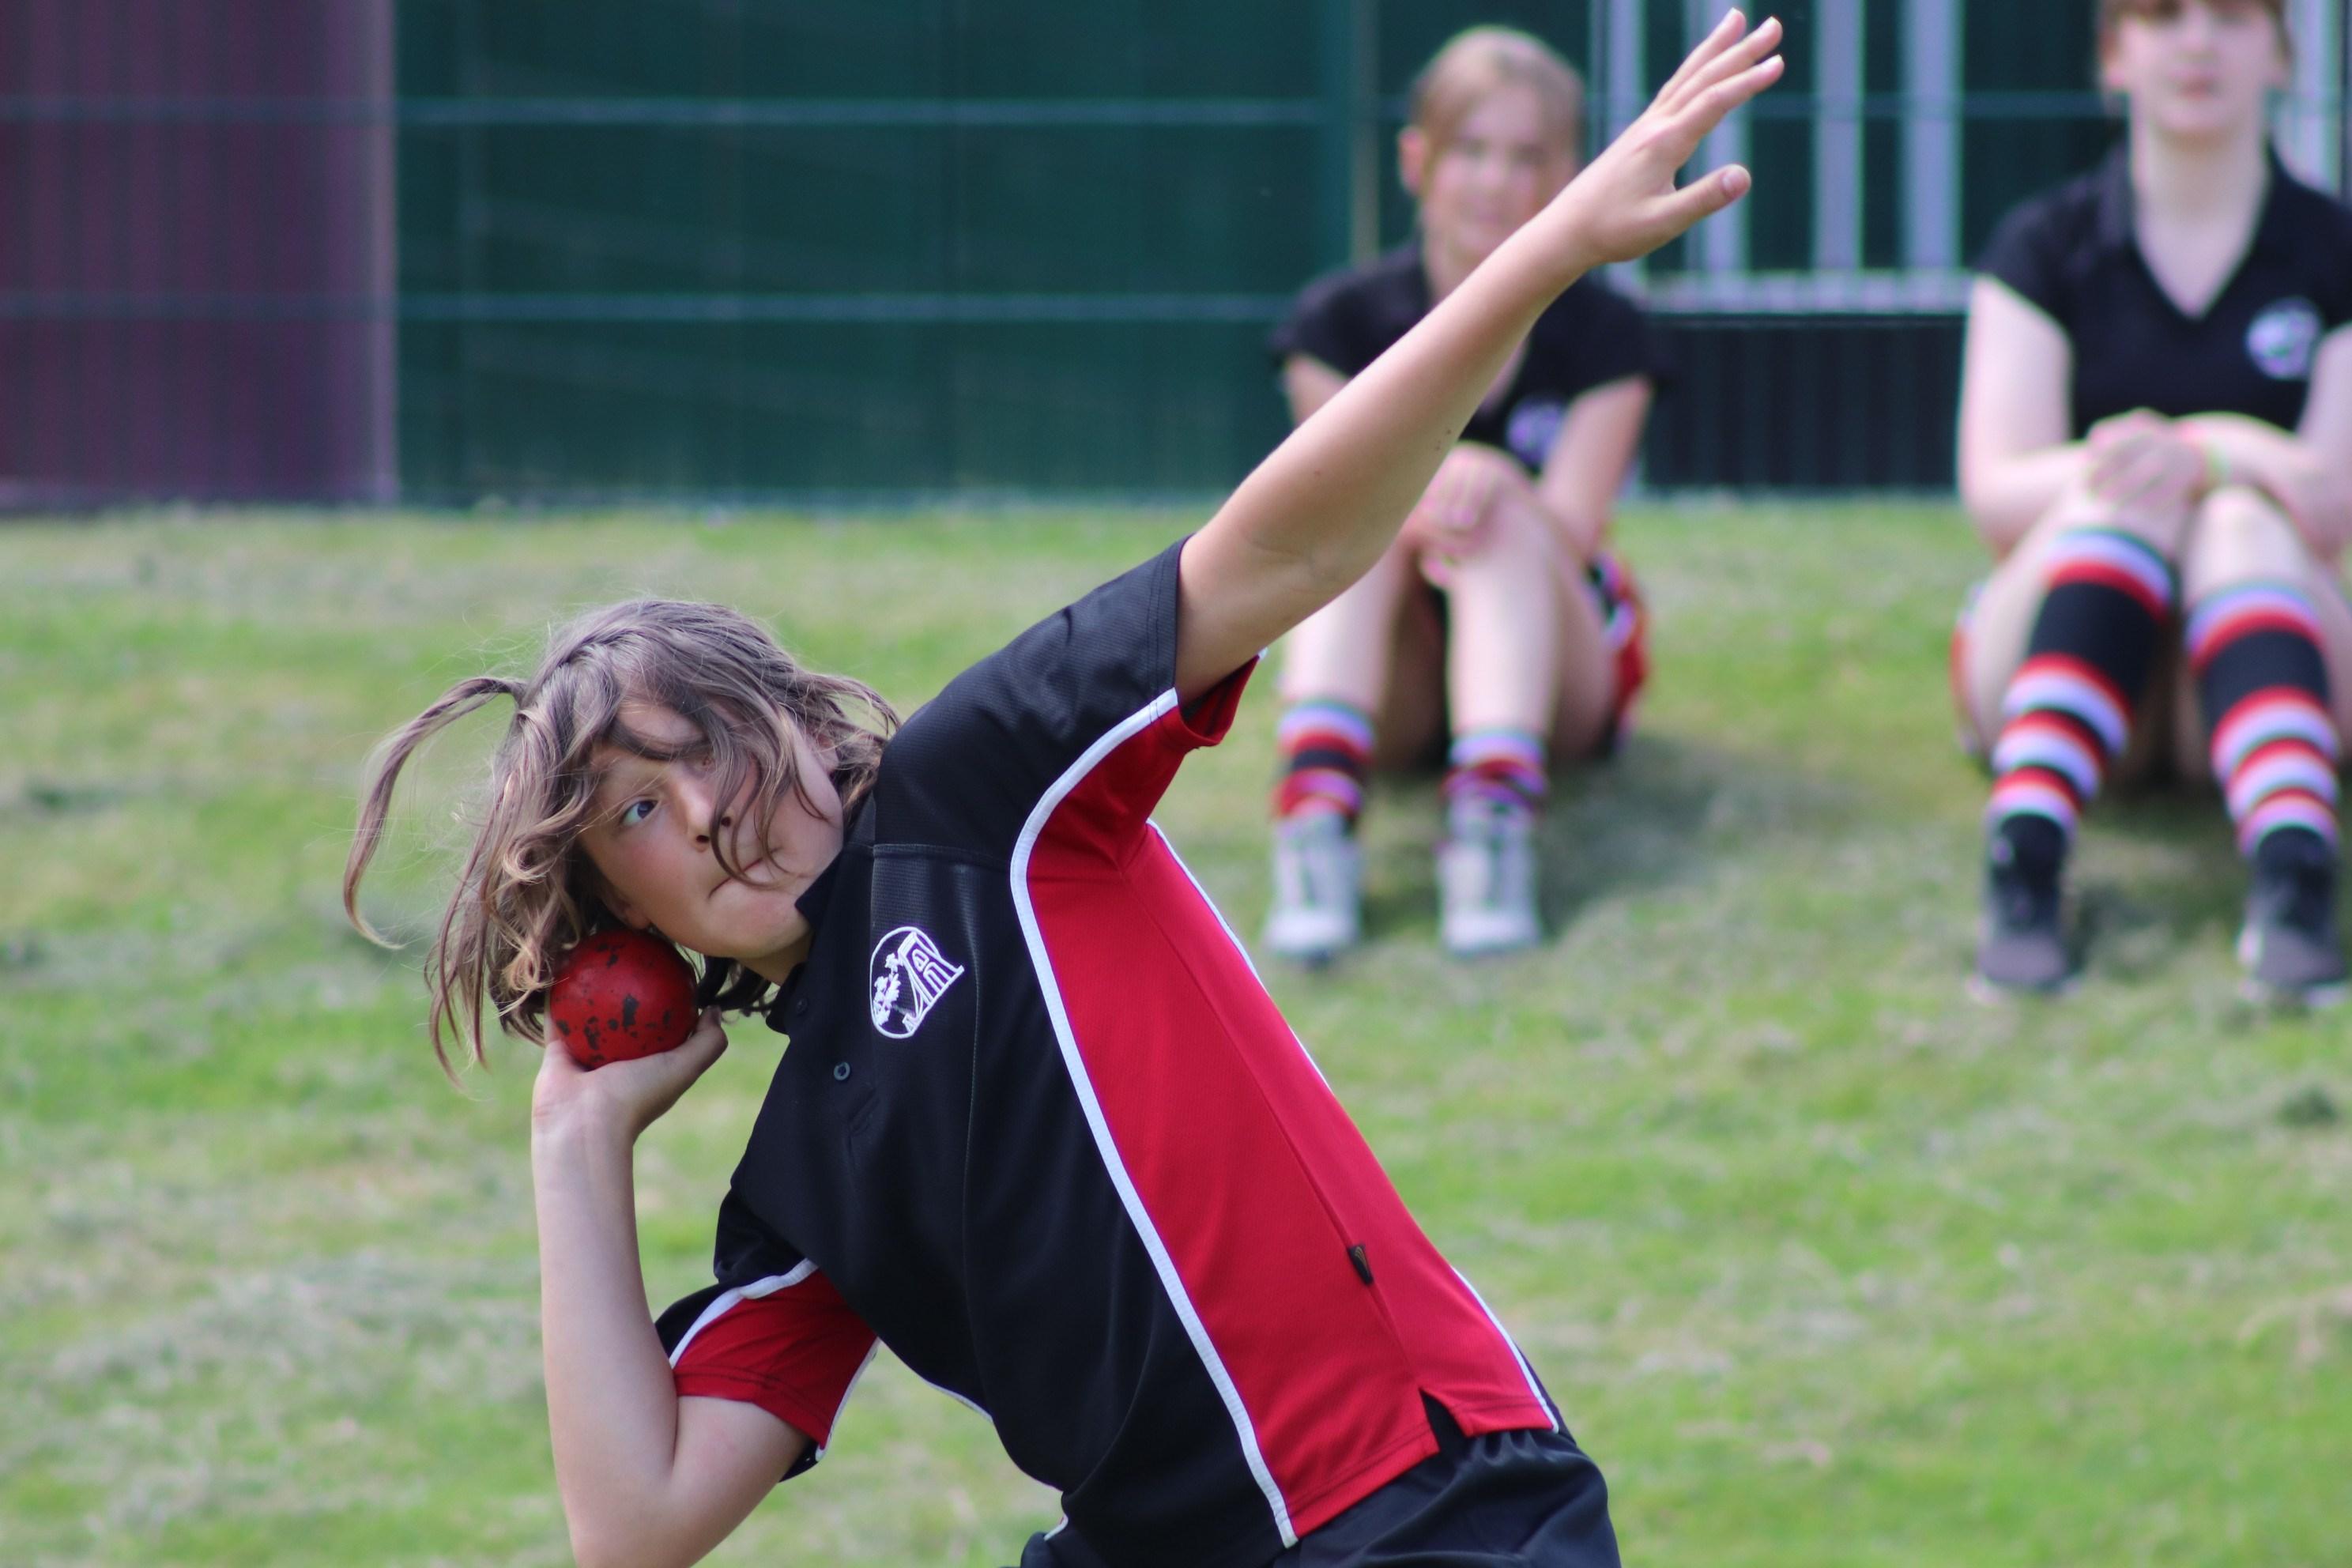 Boy throwing.jpg